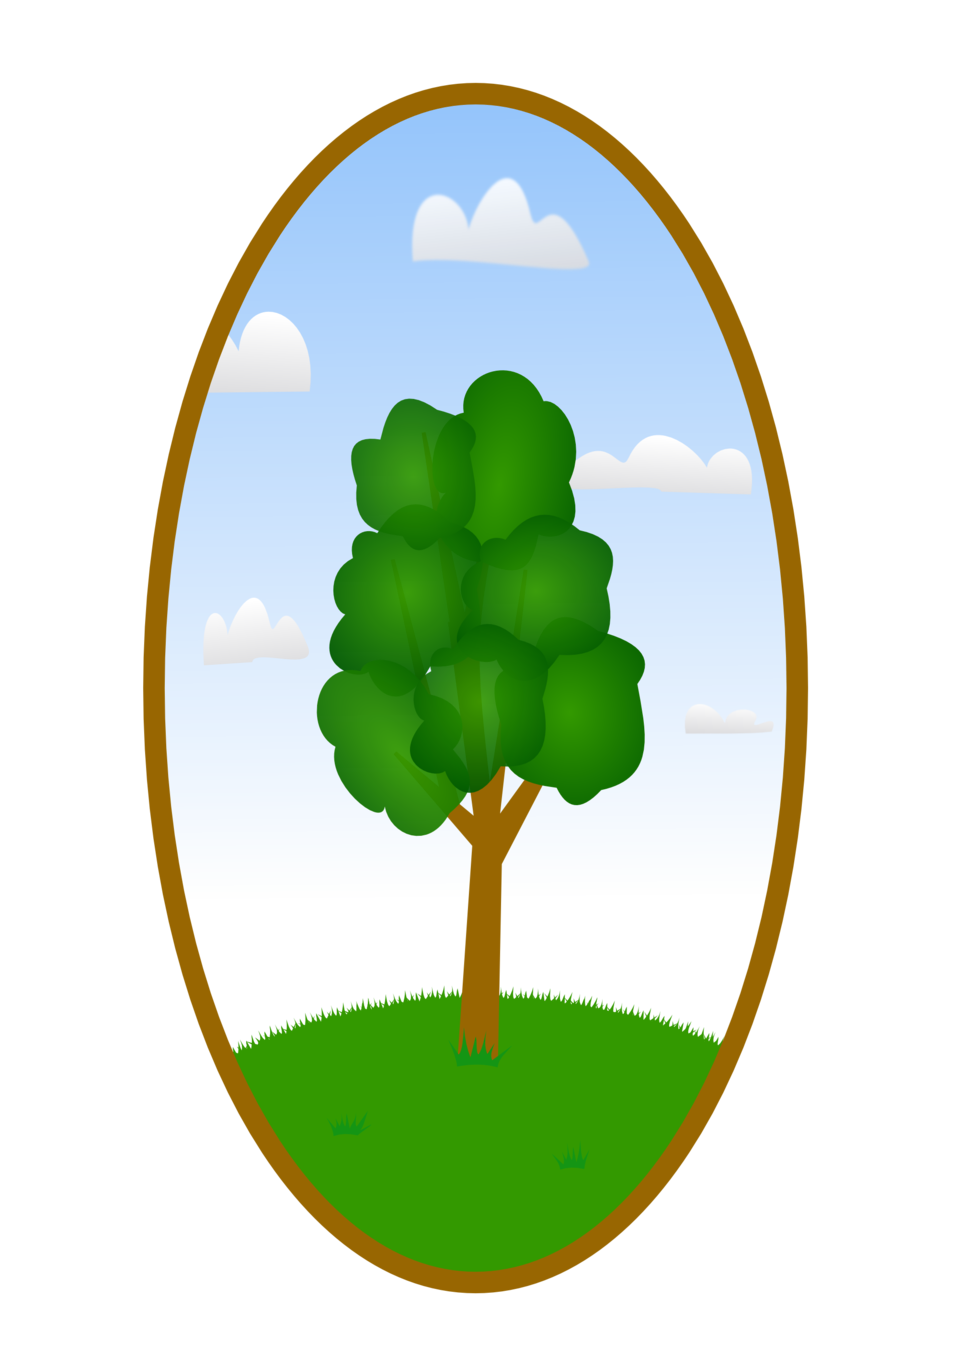 Tree landscape clipart jpg free download Public Domain Clip Art Image | Oval Tree Landscape 2 | ID ... jpg free download